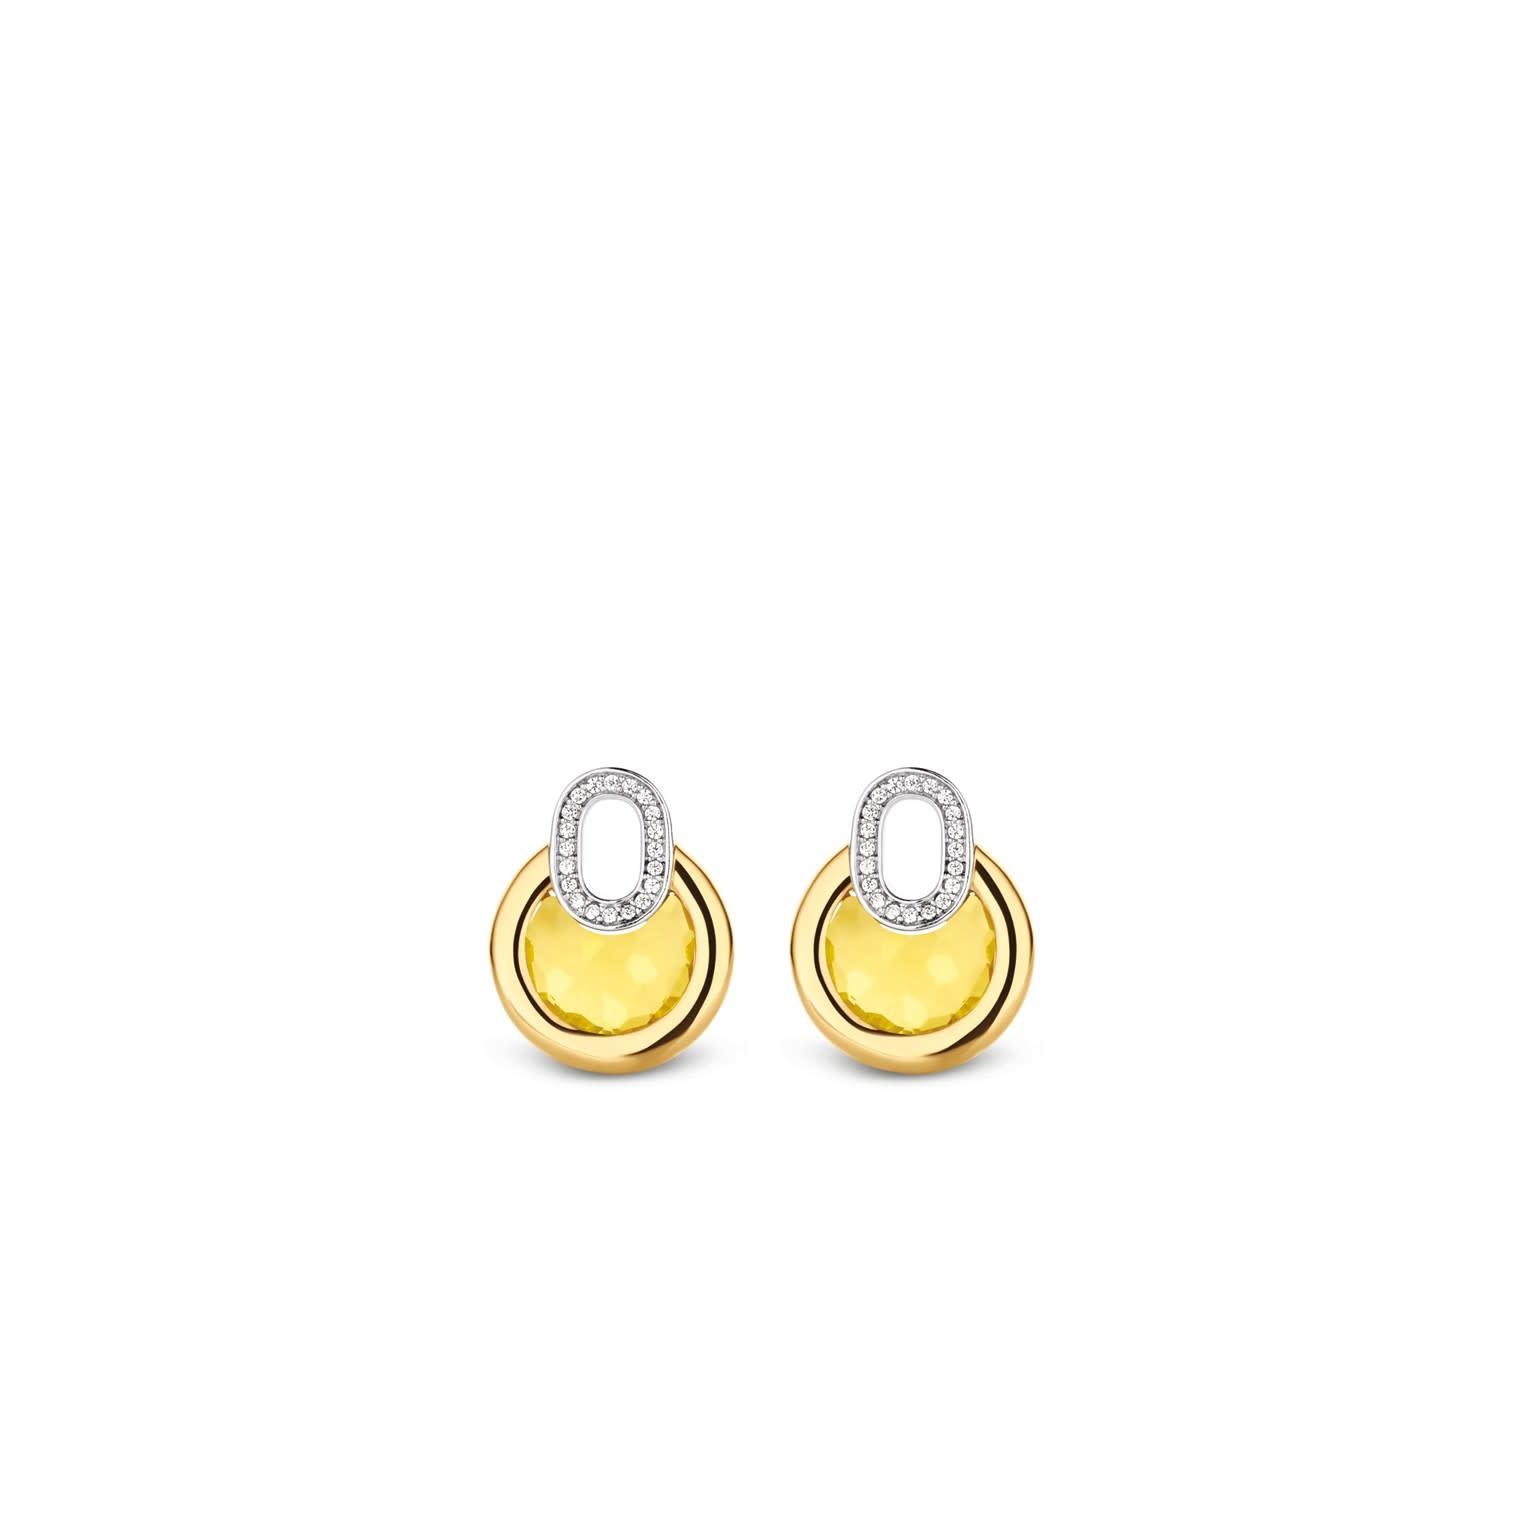 TI SENTO - Milano Ear Charms 9206TY-1